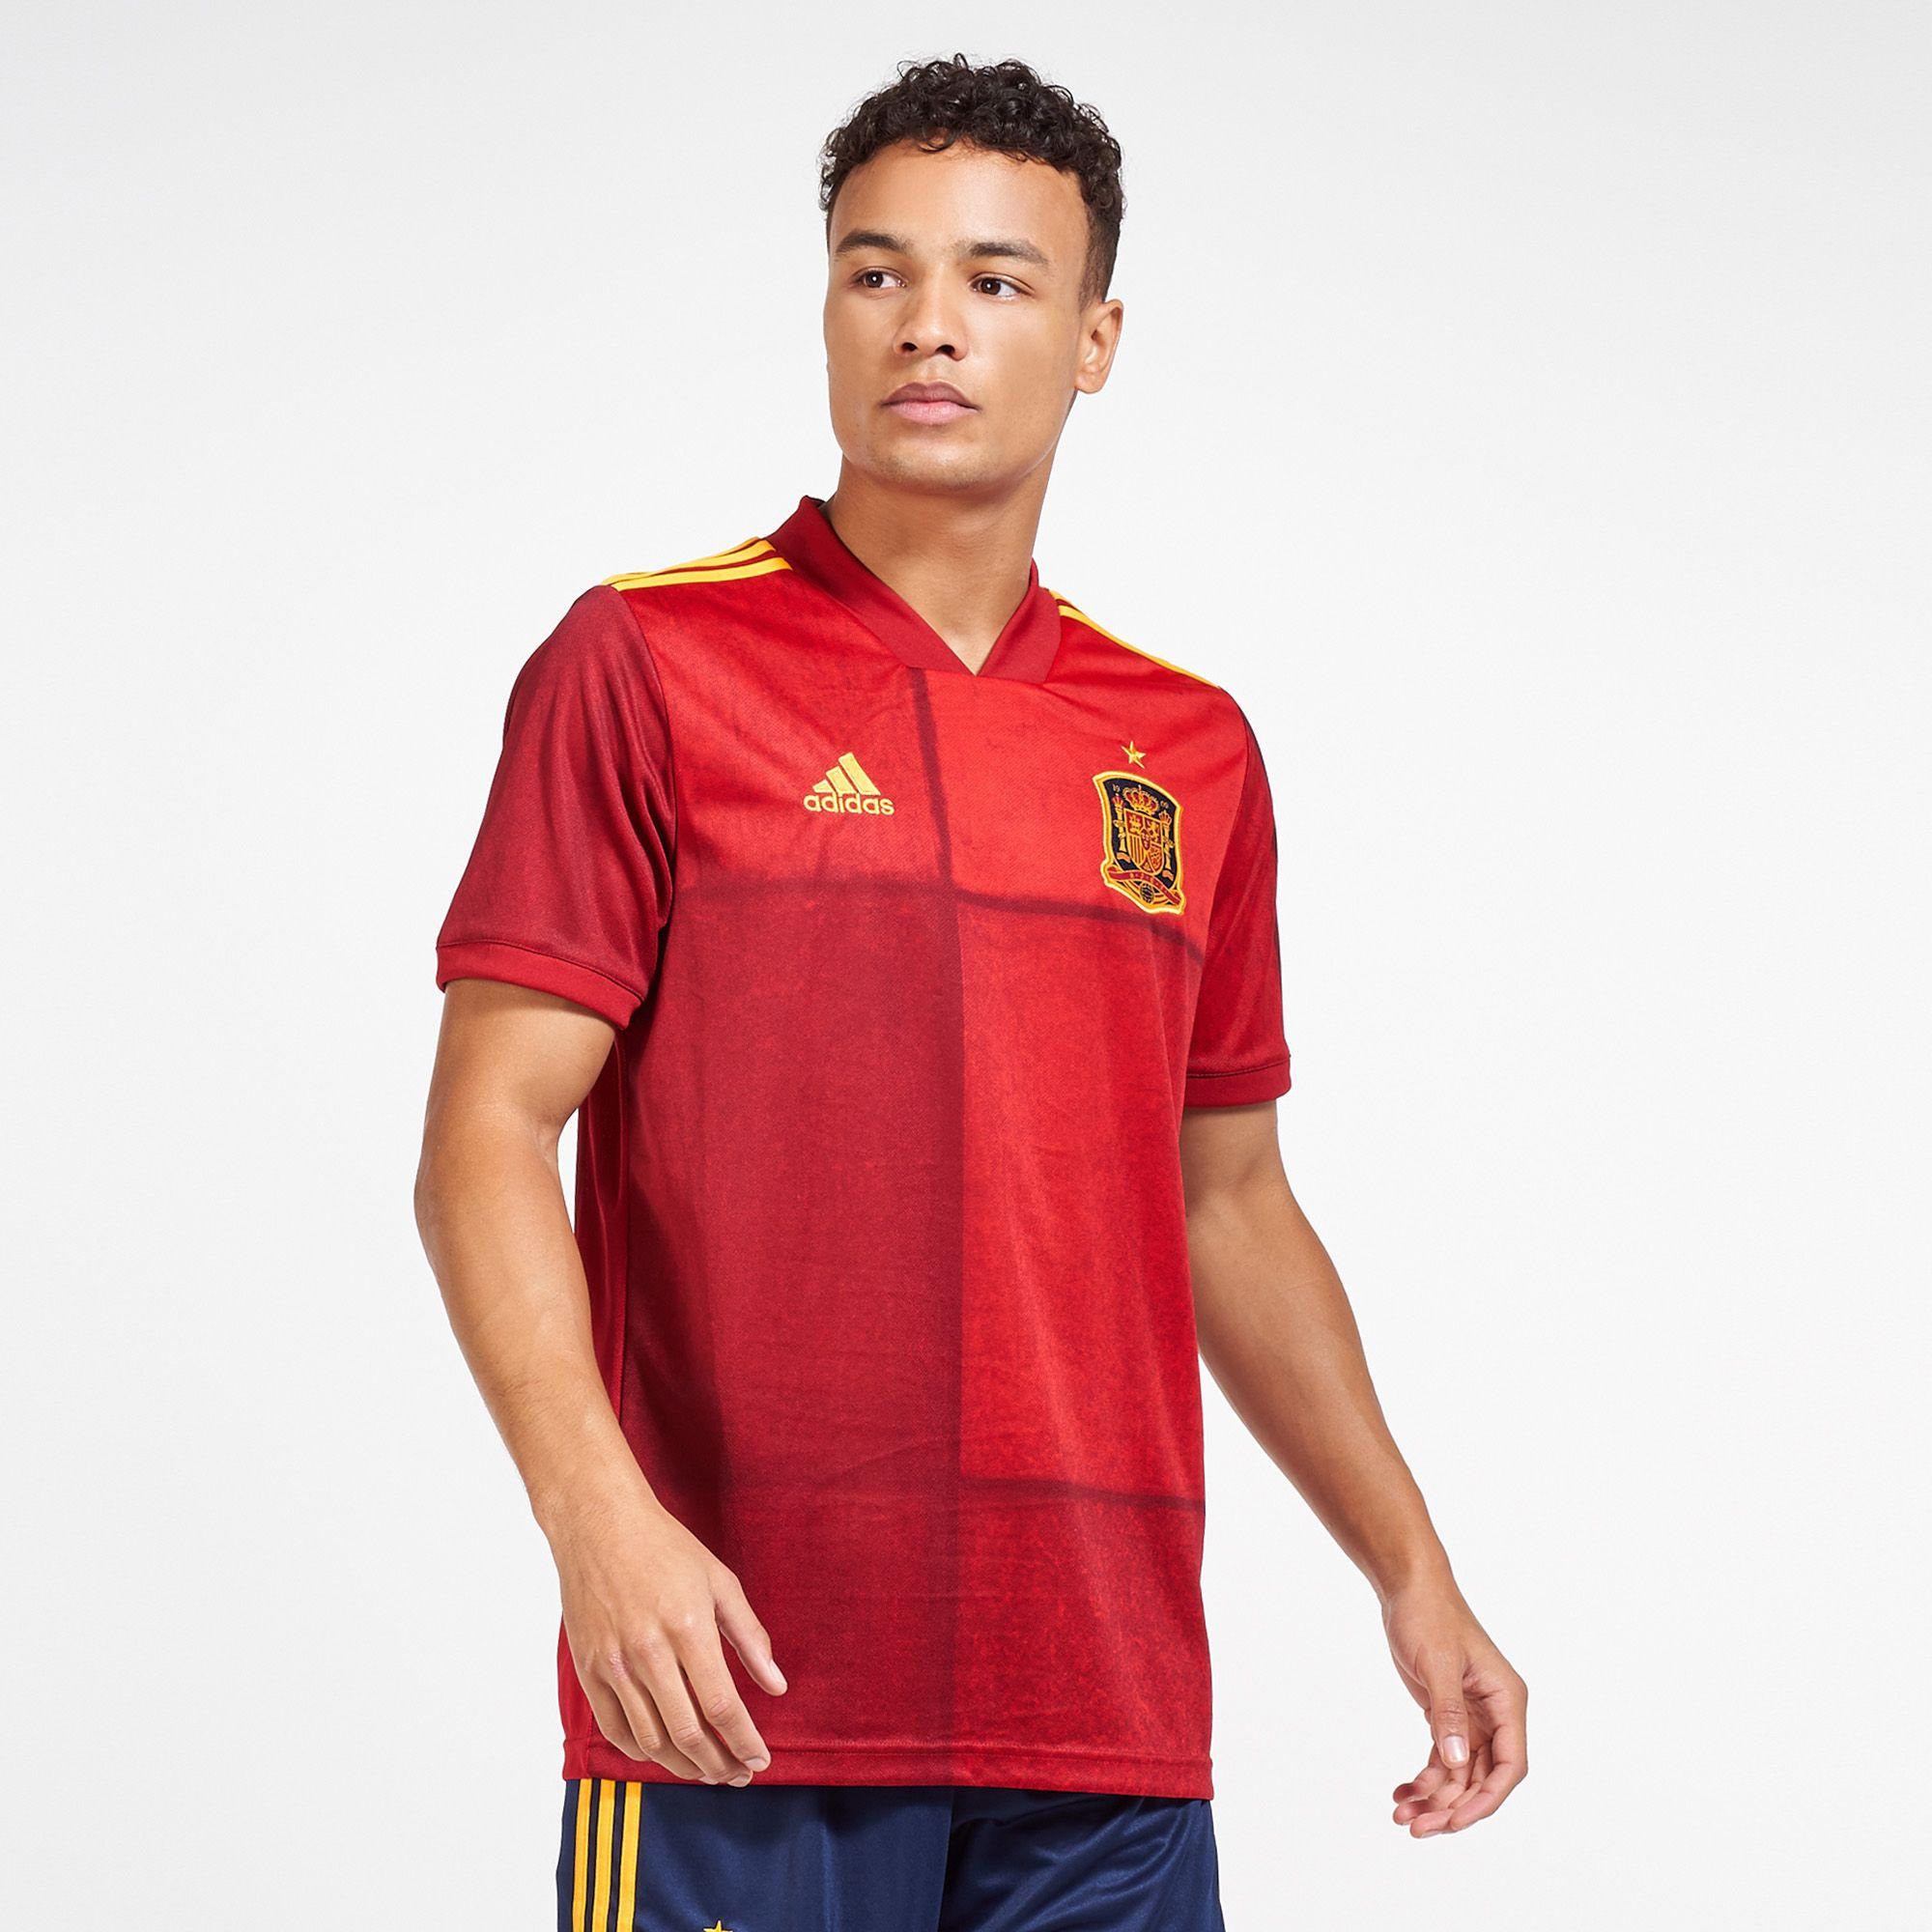 adidas Men's Spain Home Jersey - 2020/21